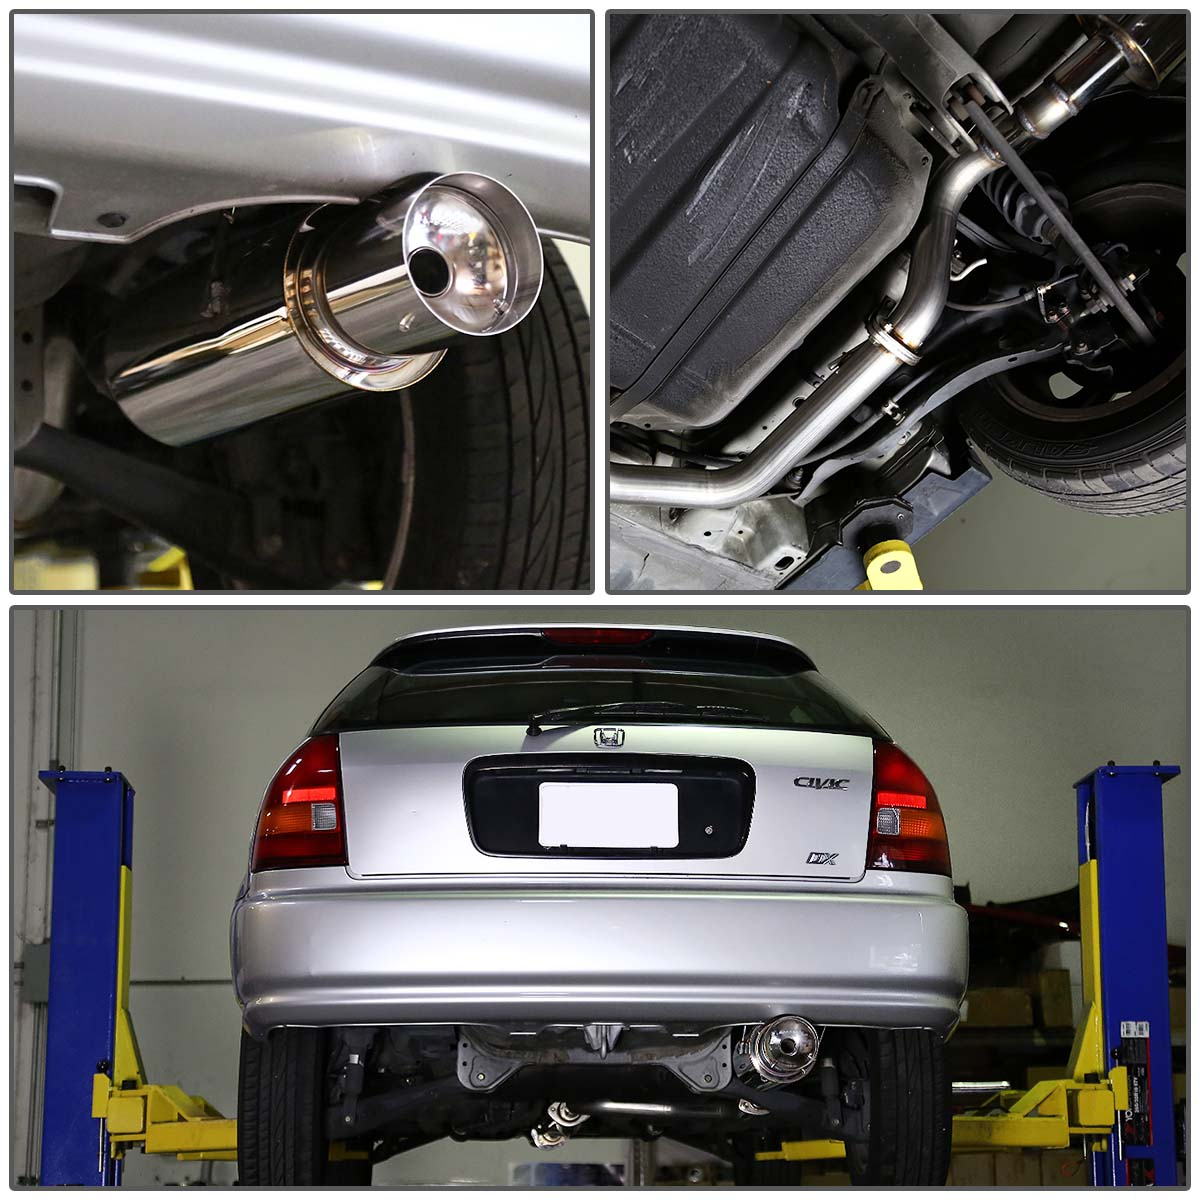 for 1996 to 2000 honda civic catback exhaust system 4 tip muffler 3 door hatchback ek 97 98 99